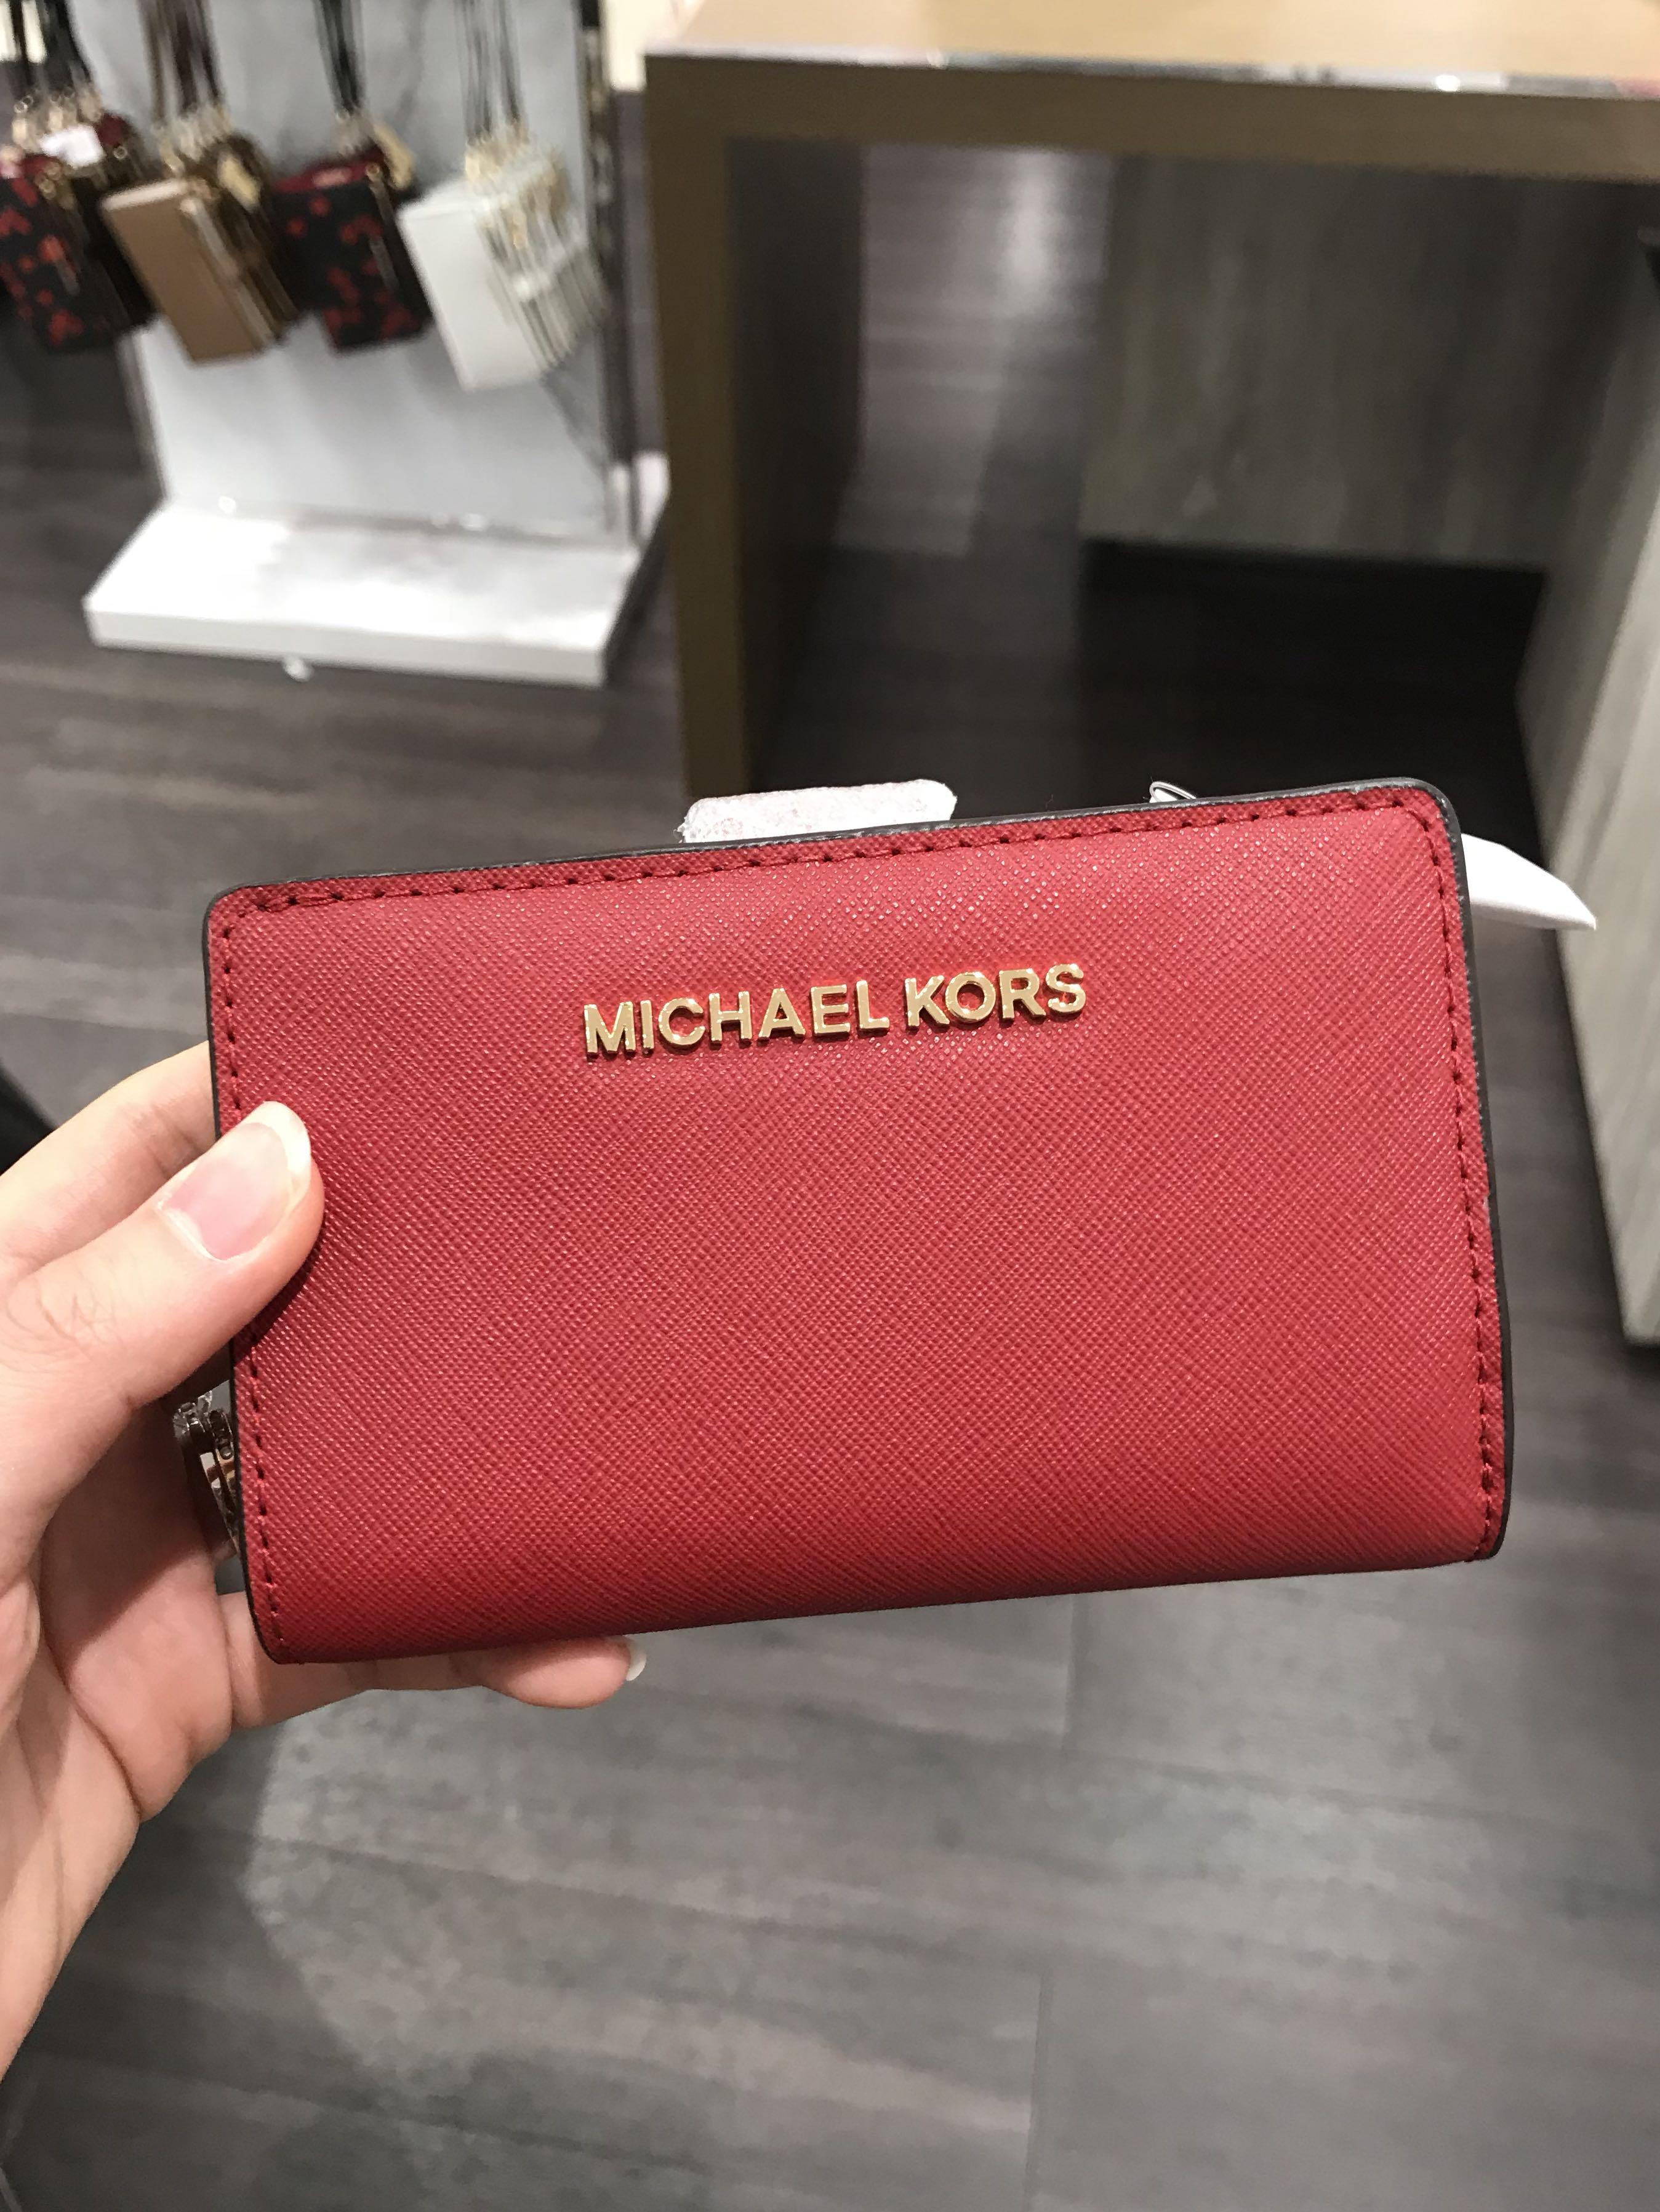 c1e9dfc3db3b Michael Kors Jet Set Travel Bifold Zip coin Wallet Red, Women's Fashion,  Bags & Wallets, Wallets on Carousell